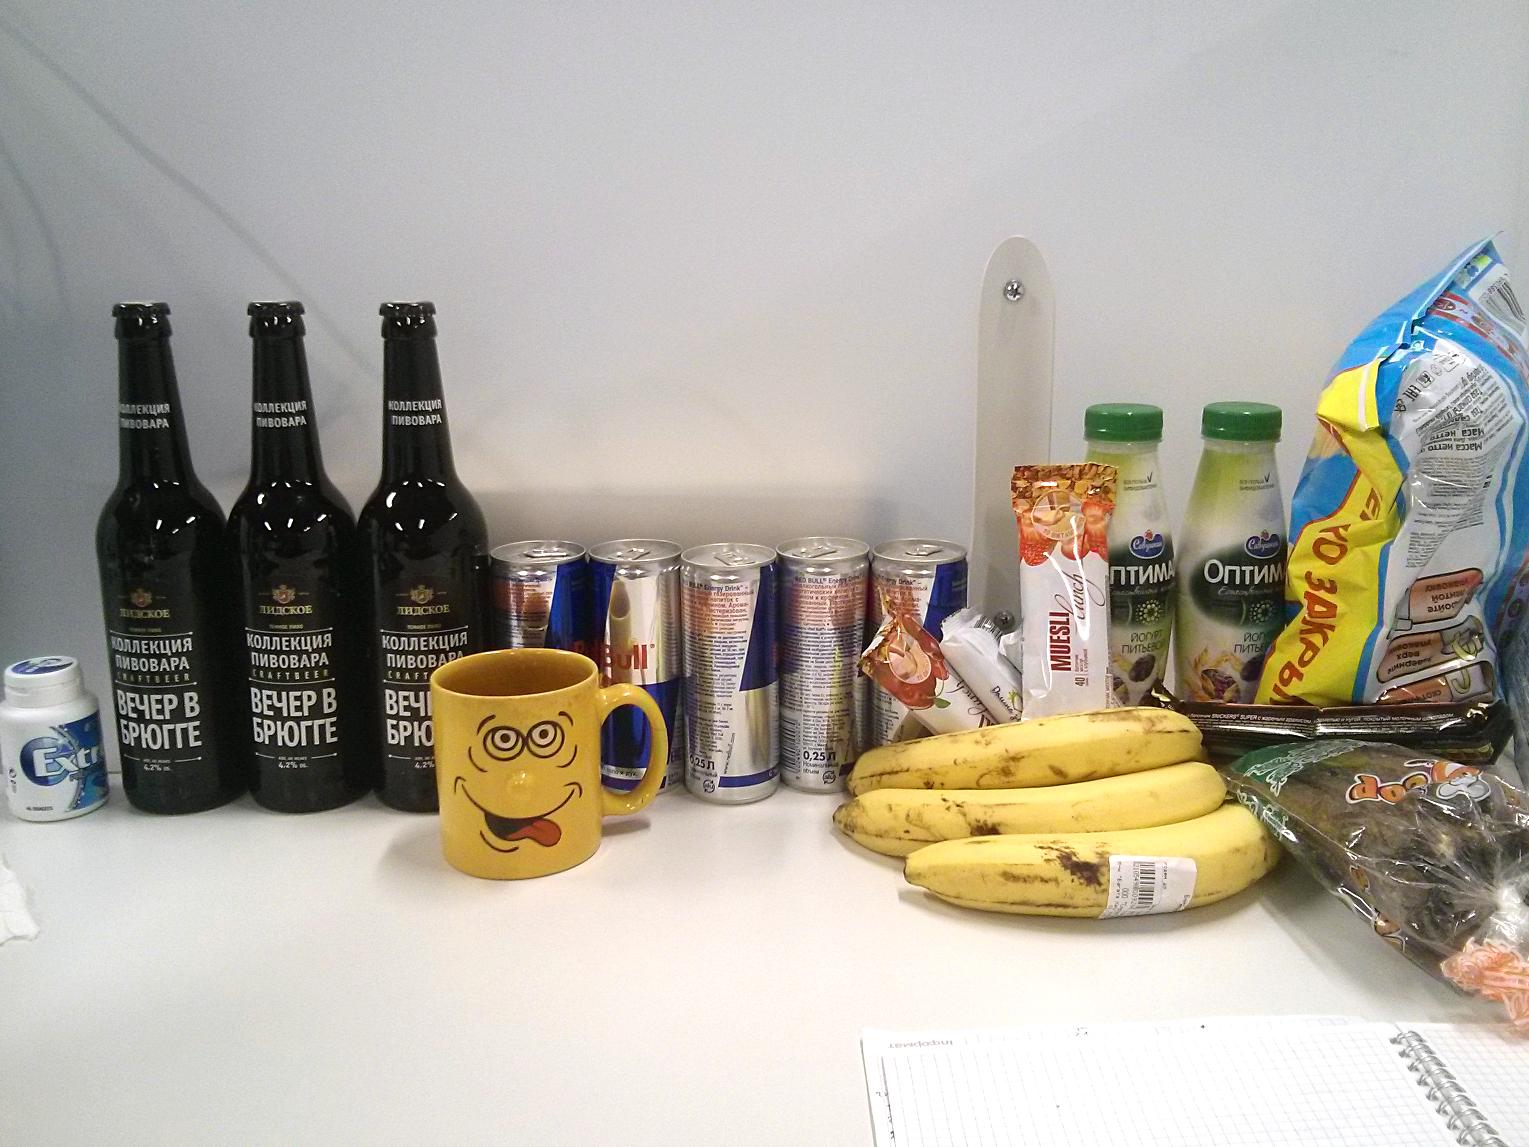 Hackathon starter kit